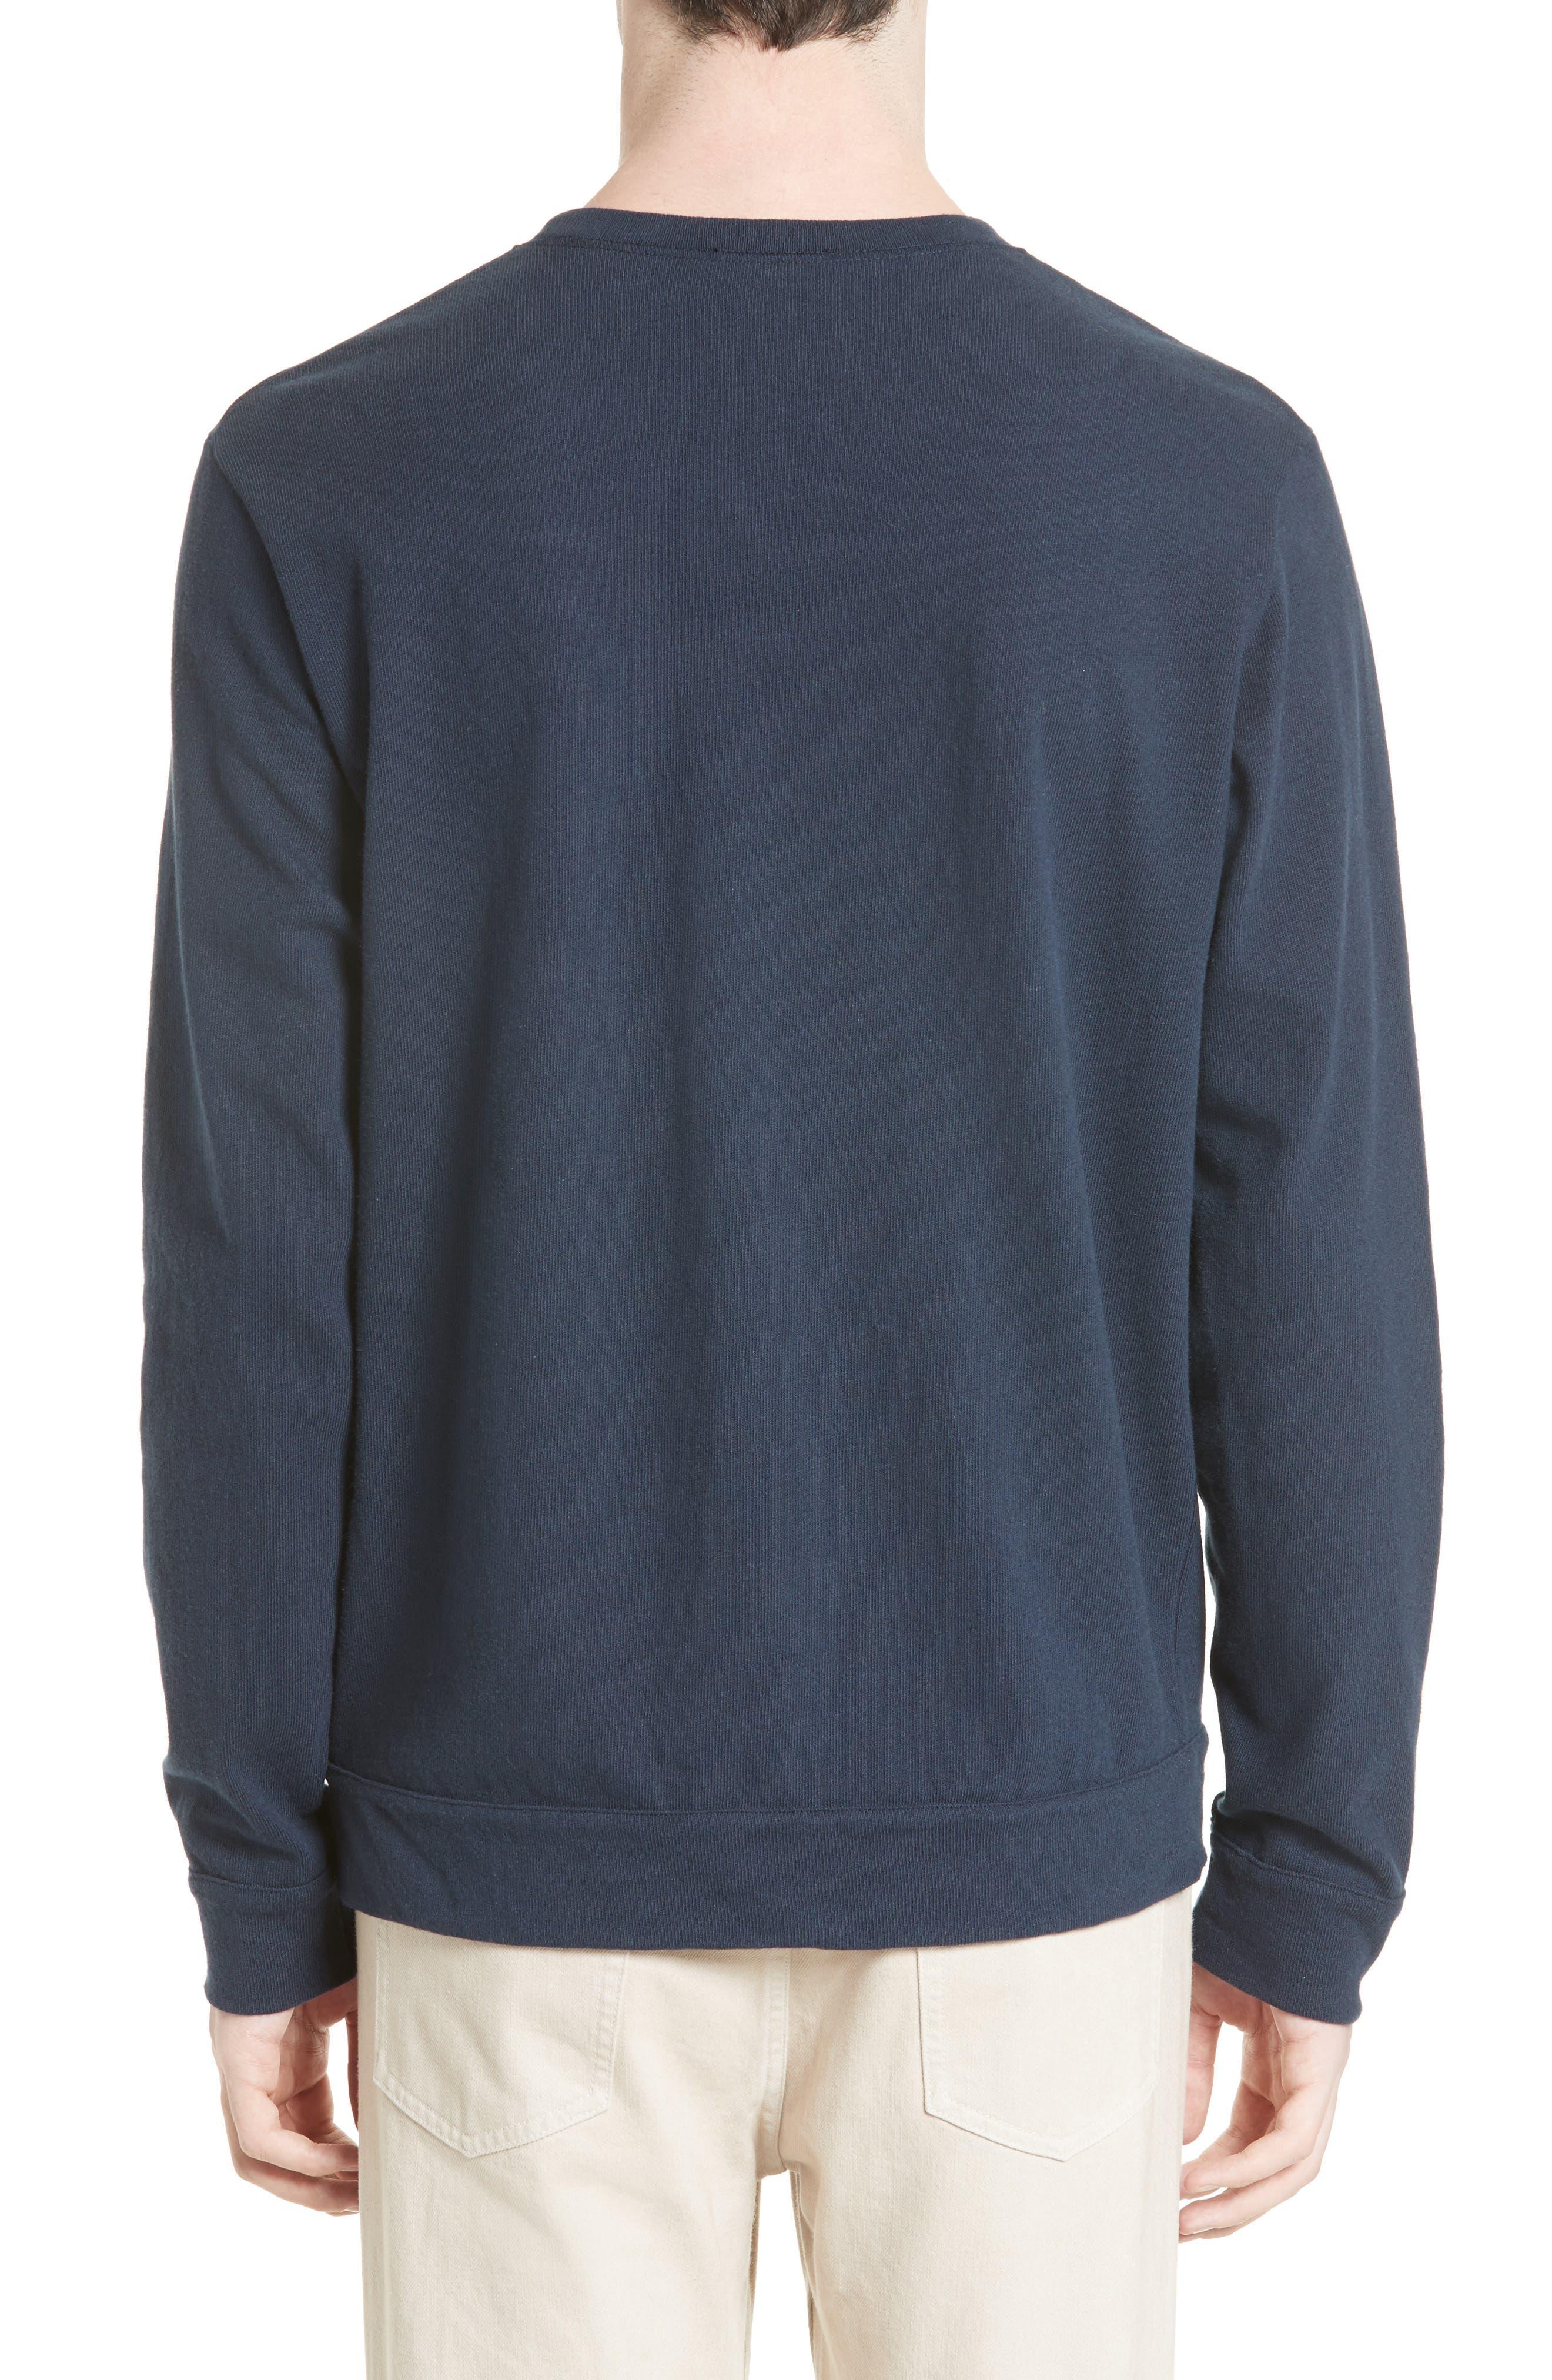 Hike Sweatshirt,                             Alternate thumbnail 2, color,                             Blue